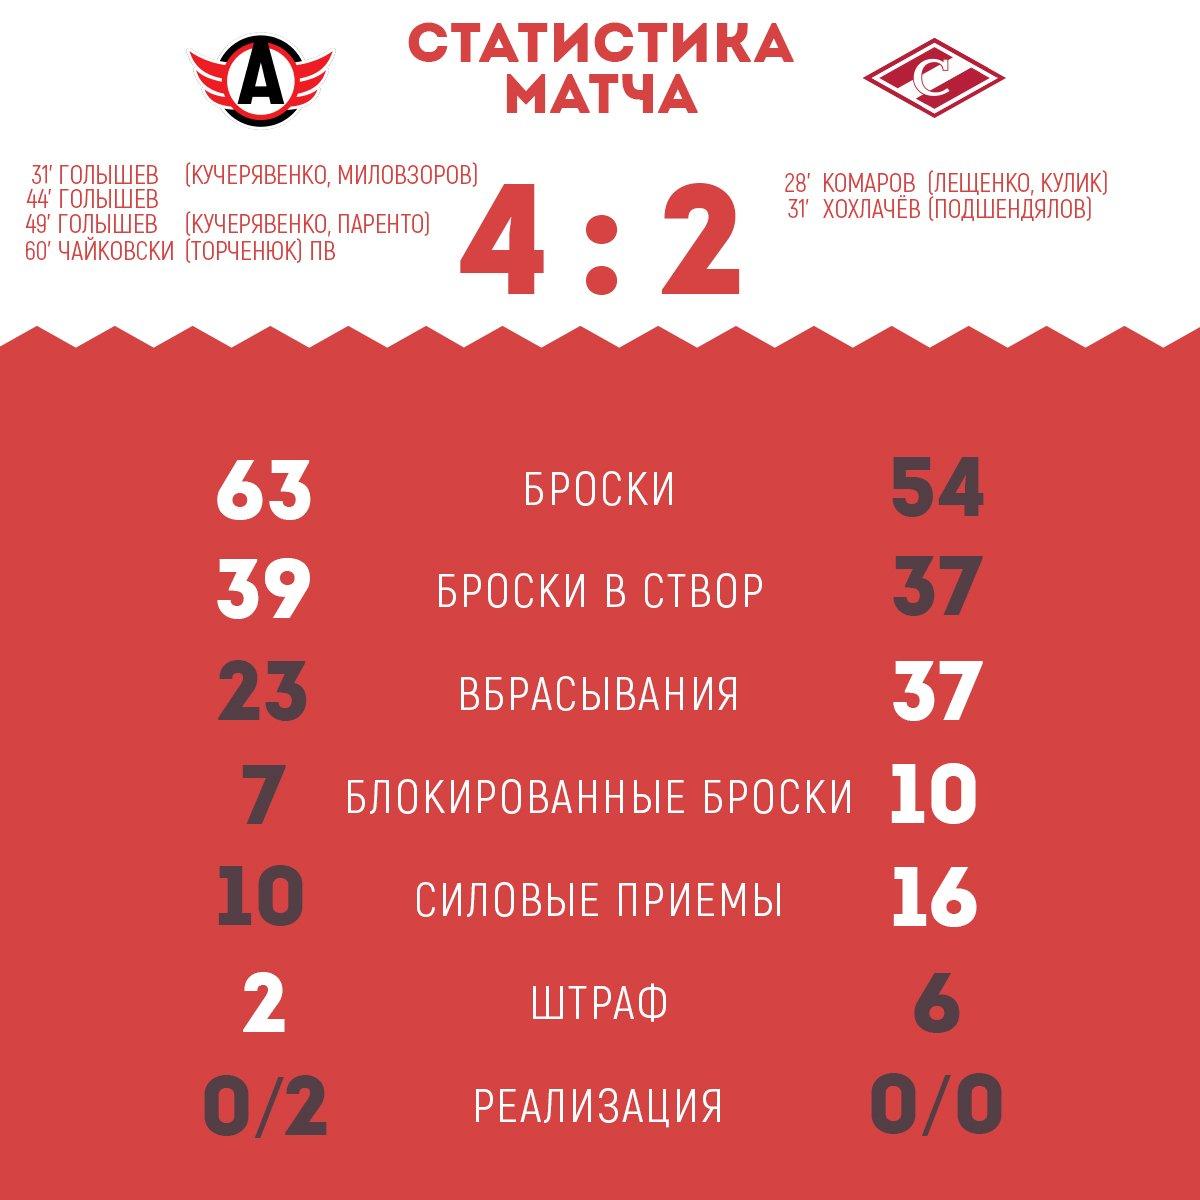 Статистика матча «Автомобилист» - «Спартак» 4:2